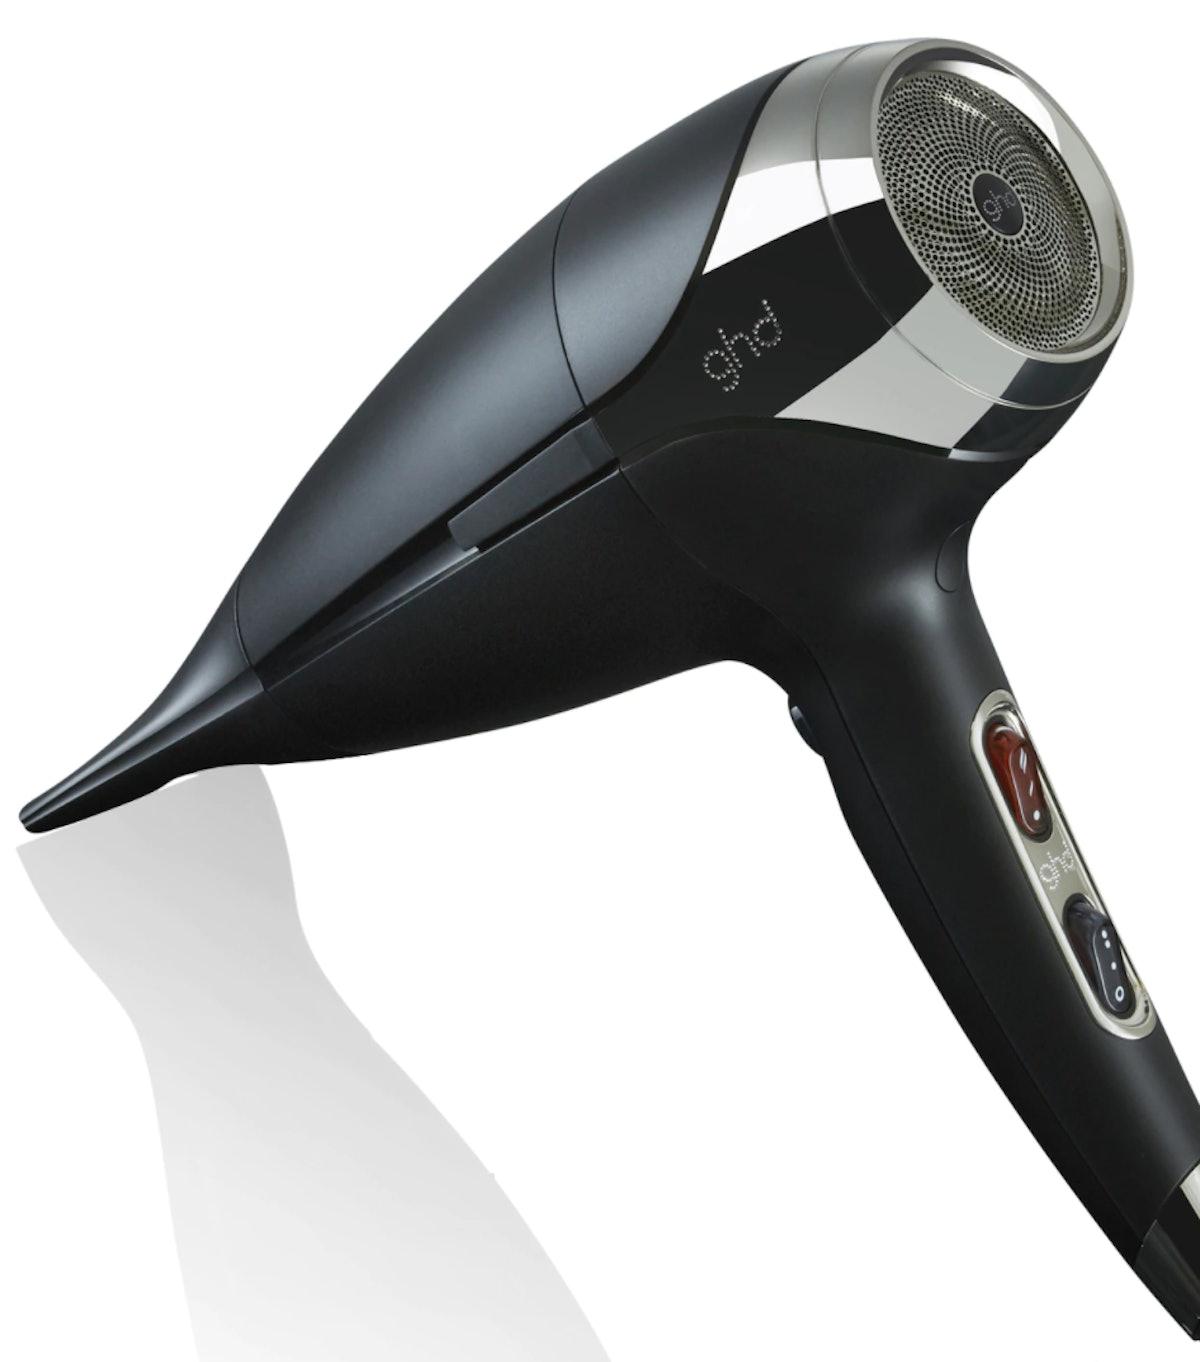 Helios 1875W Professional Hair Dryer